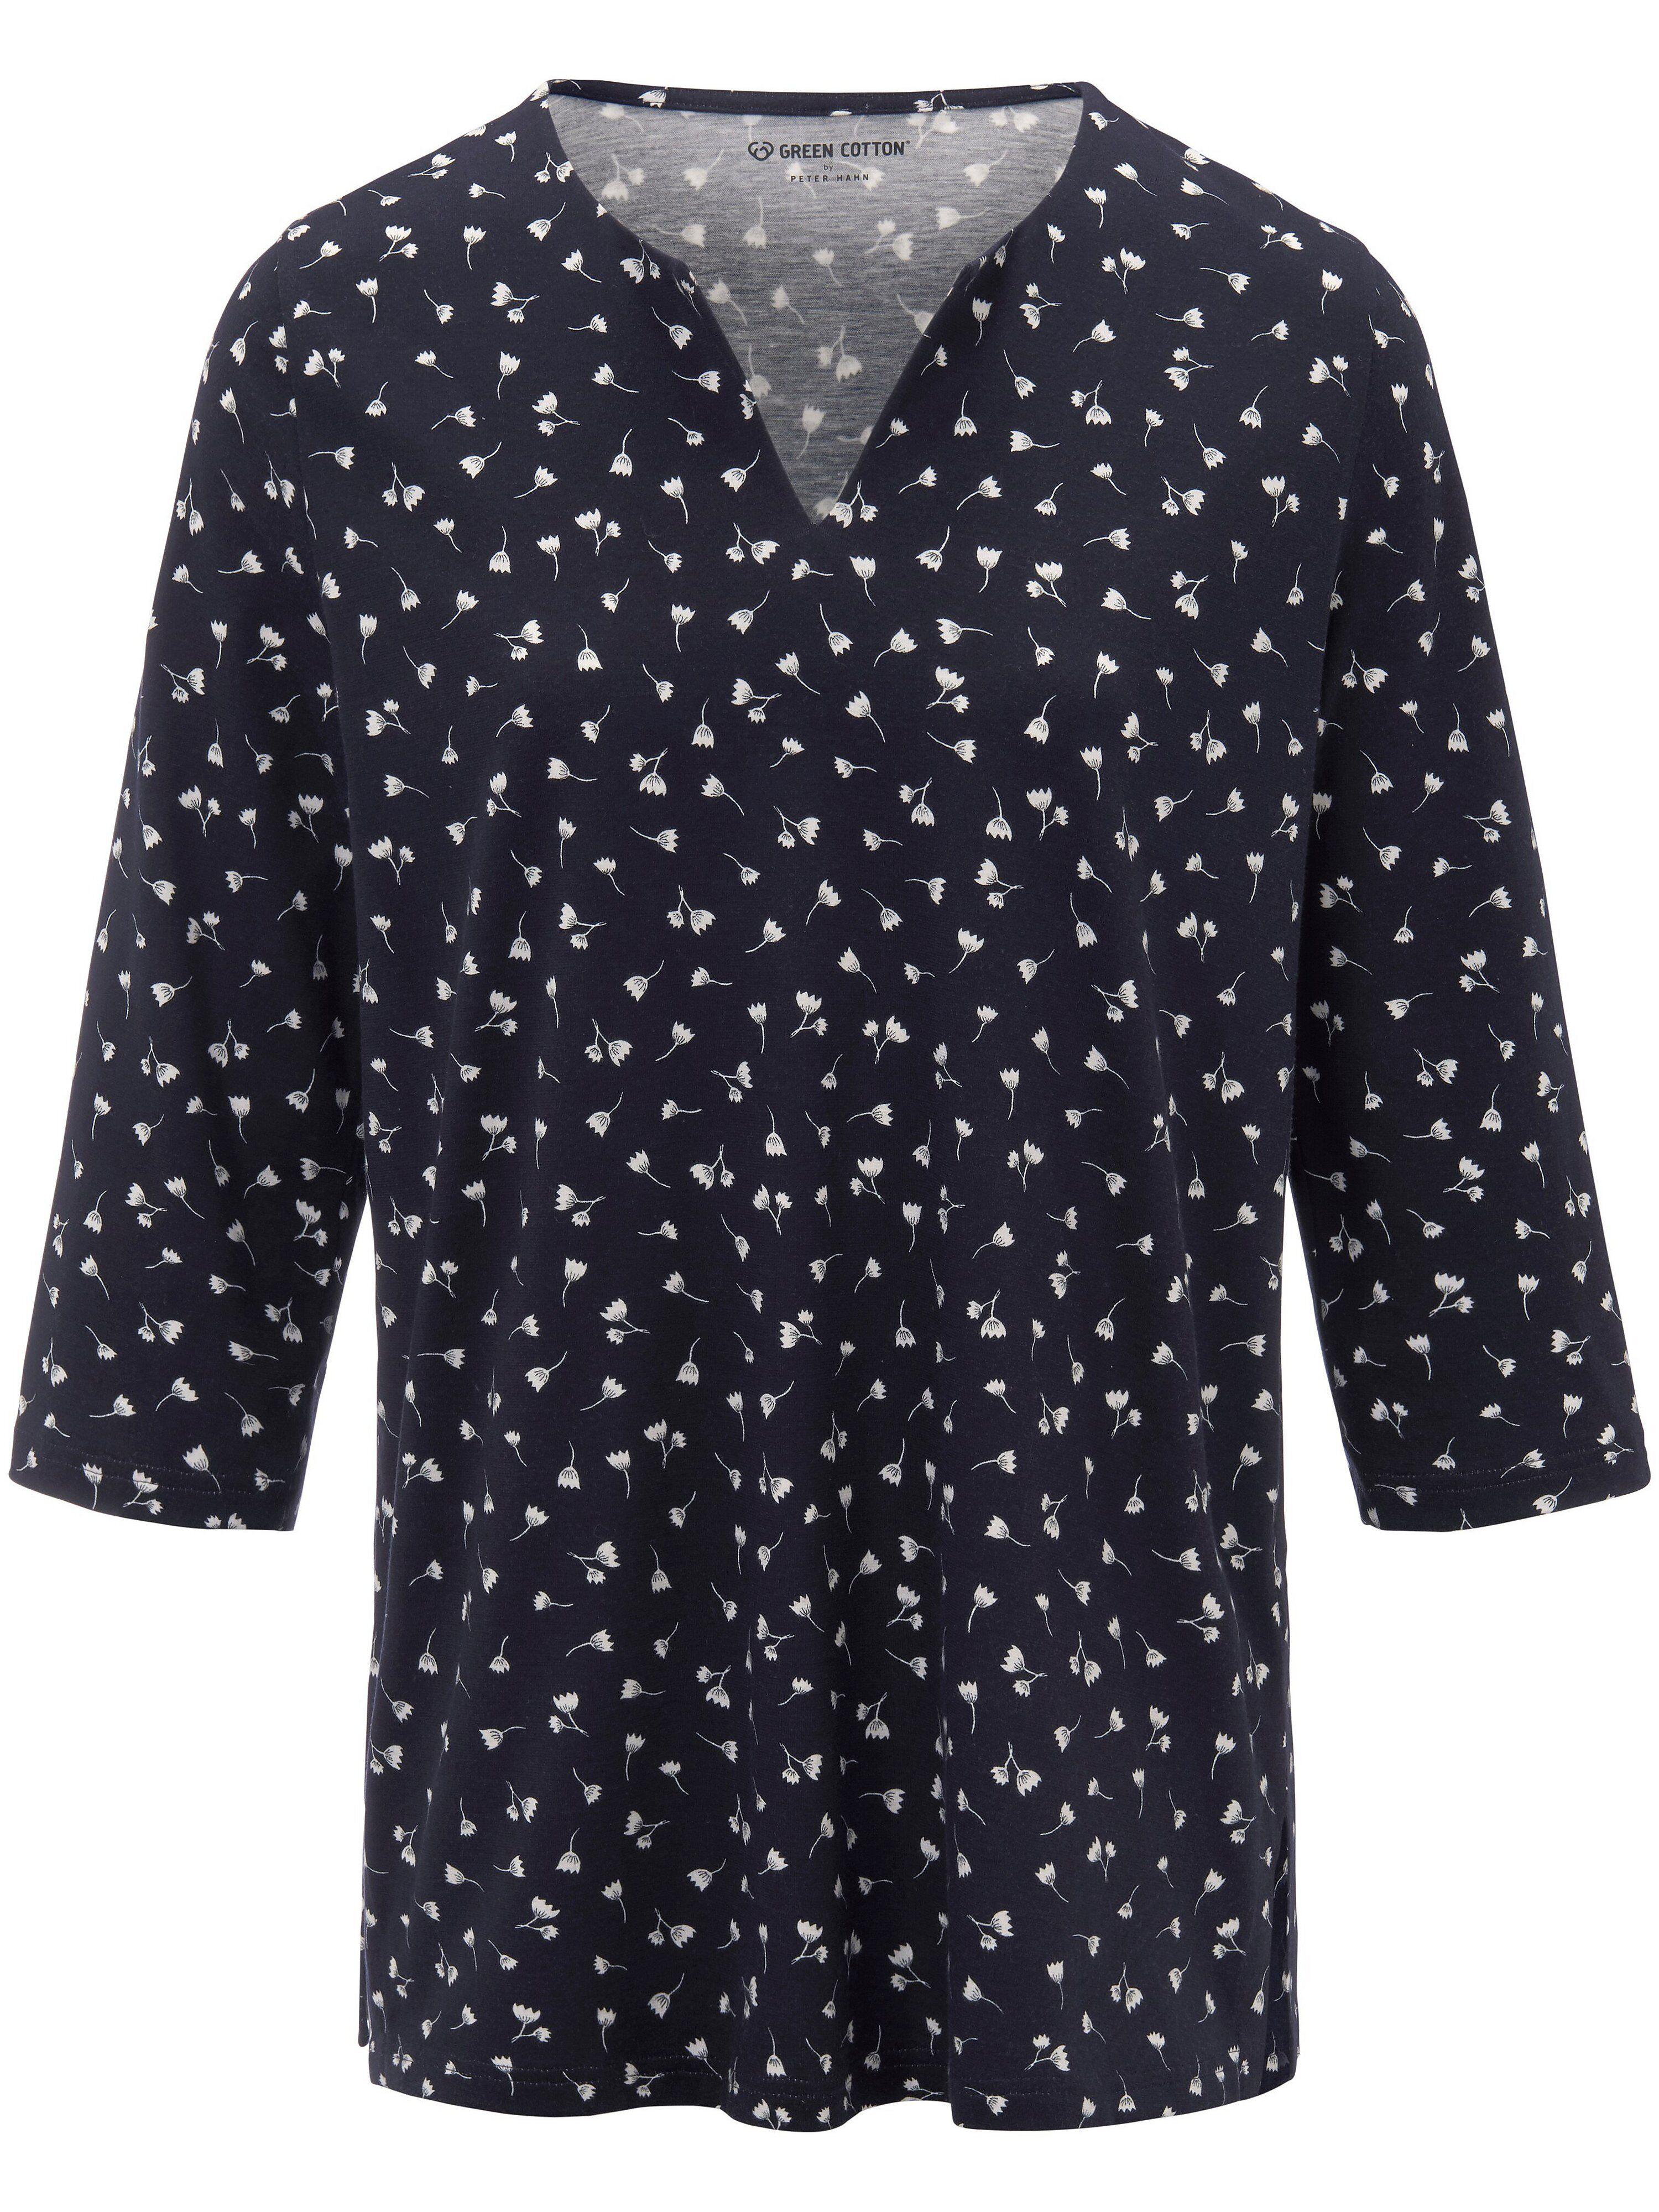 Green Cotton Le T-shirt 100% coton manches 3/4  Green Cotton bleu  - Femme - 54